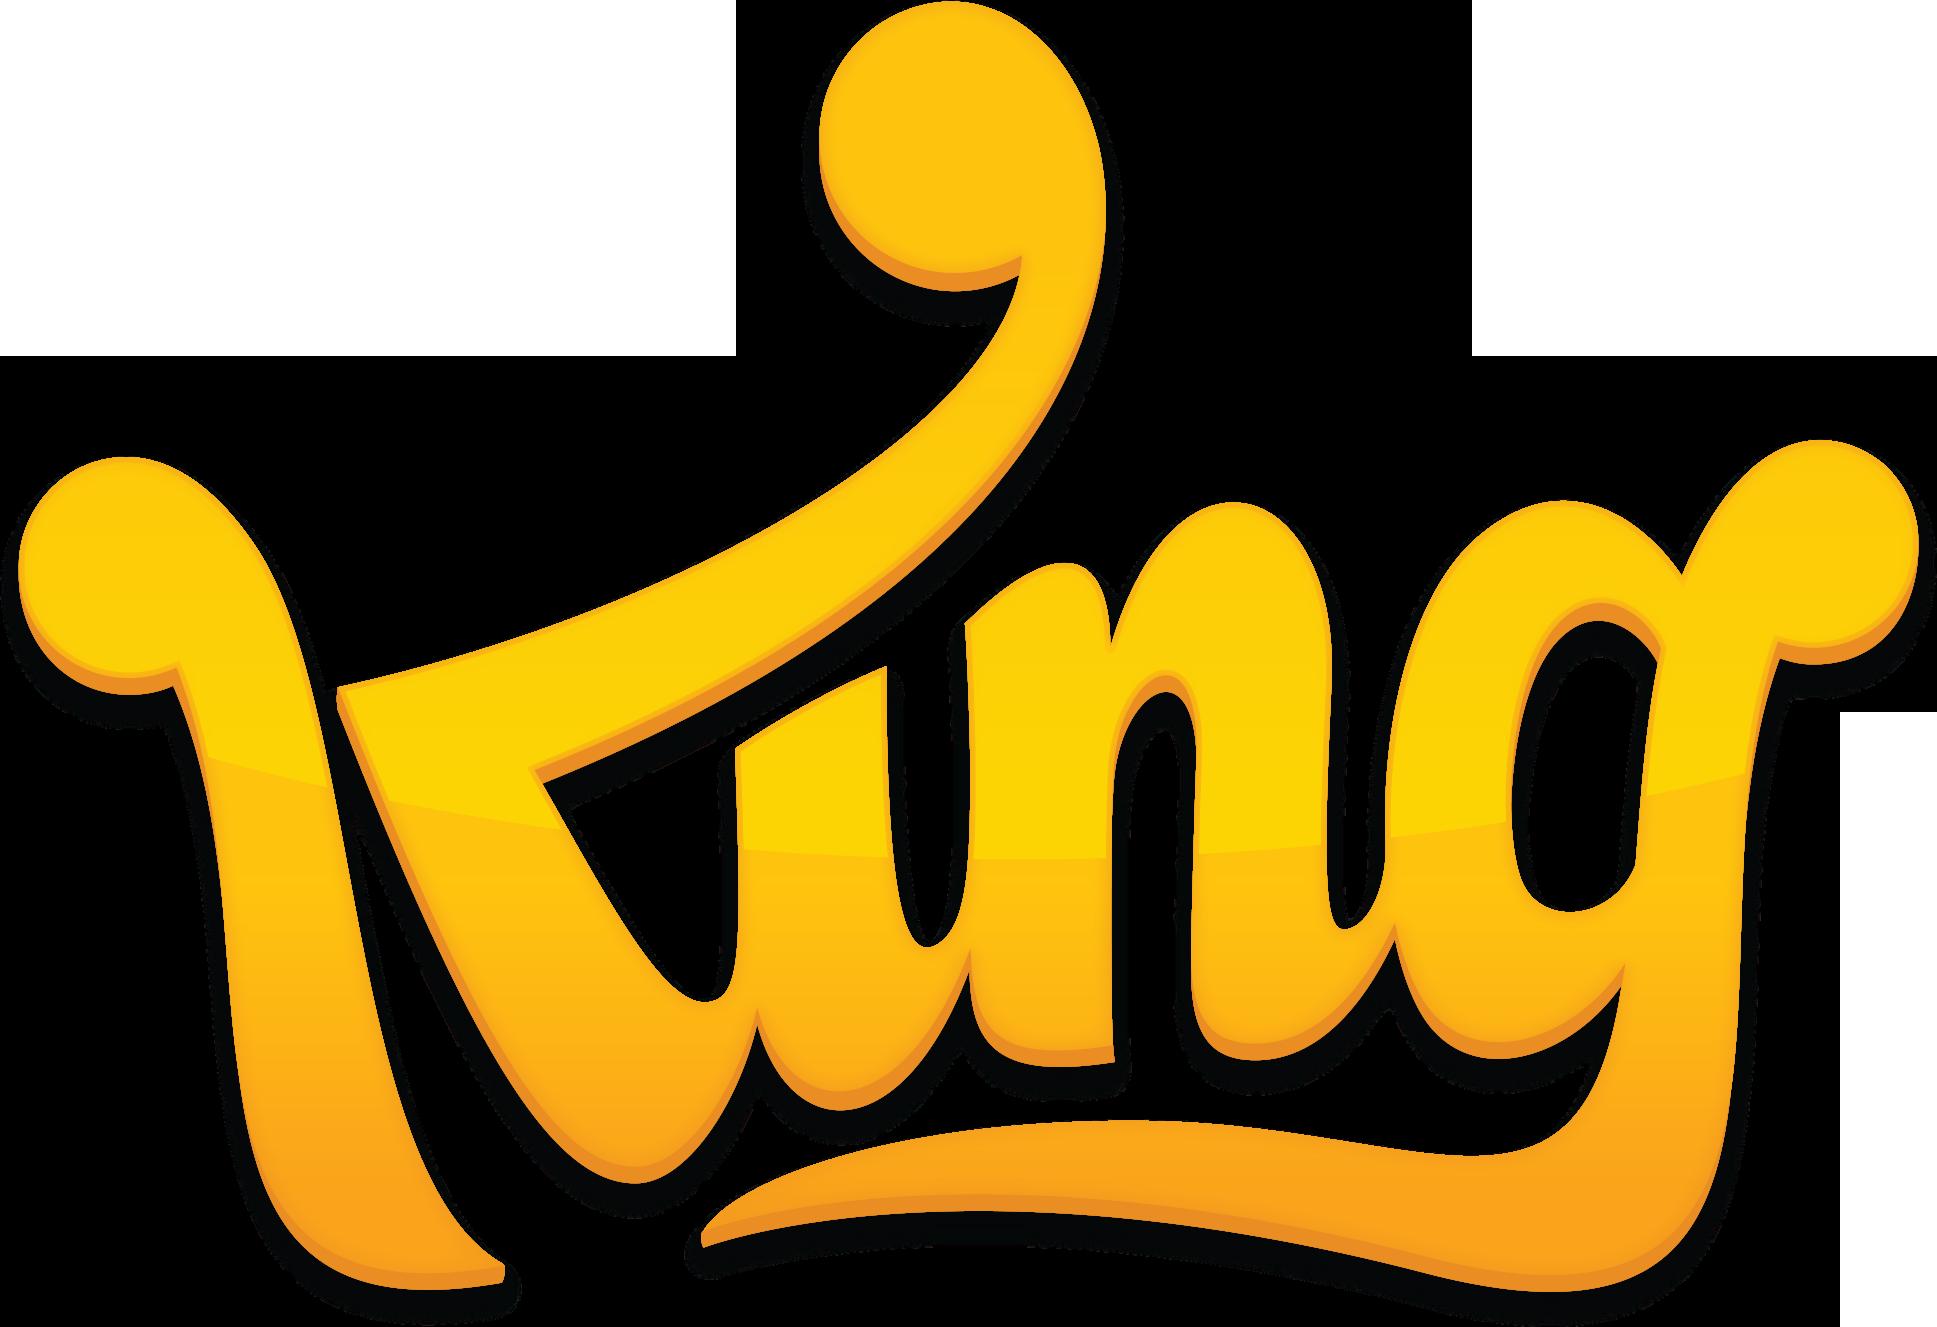 King Digital Entertainment company logo.